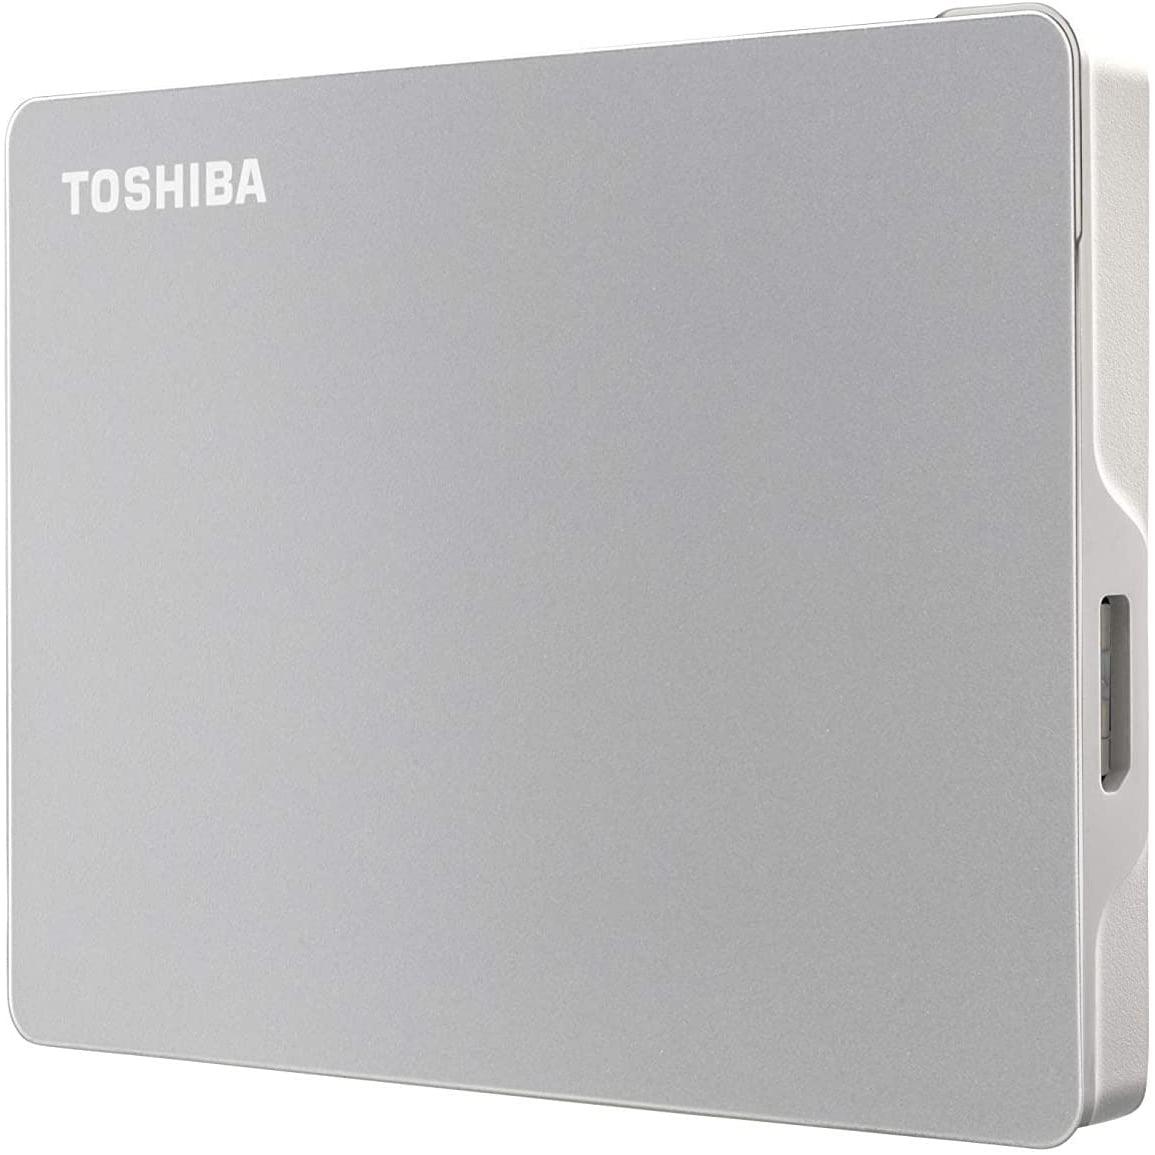 HDD extern Toshiba Canvio Flex, HDTX120ESCAA, 2TB, 2.5″, USB 3.2 Gen 1, Silver